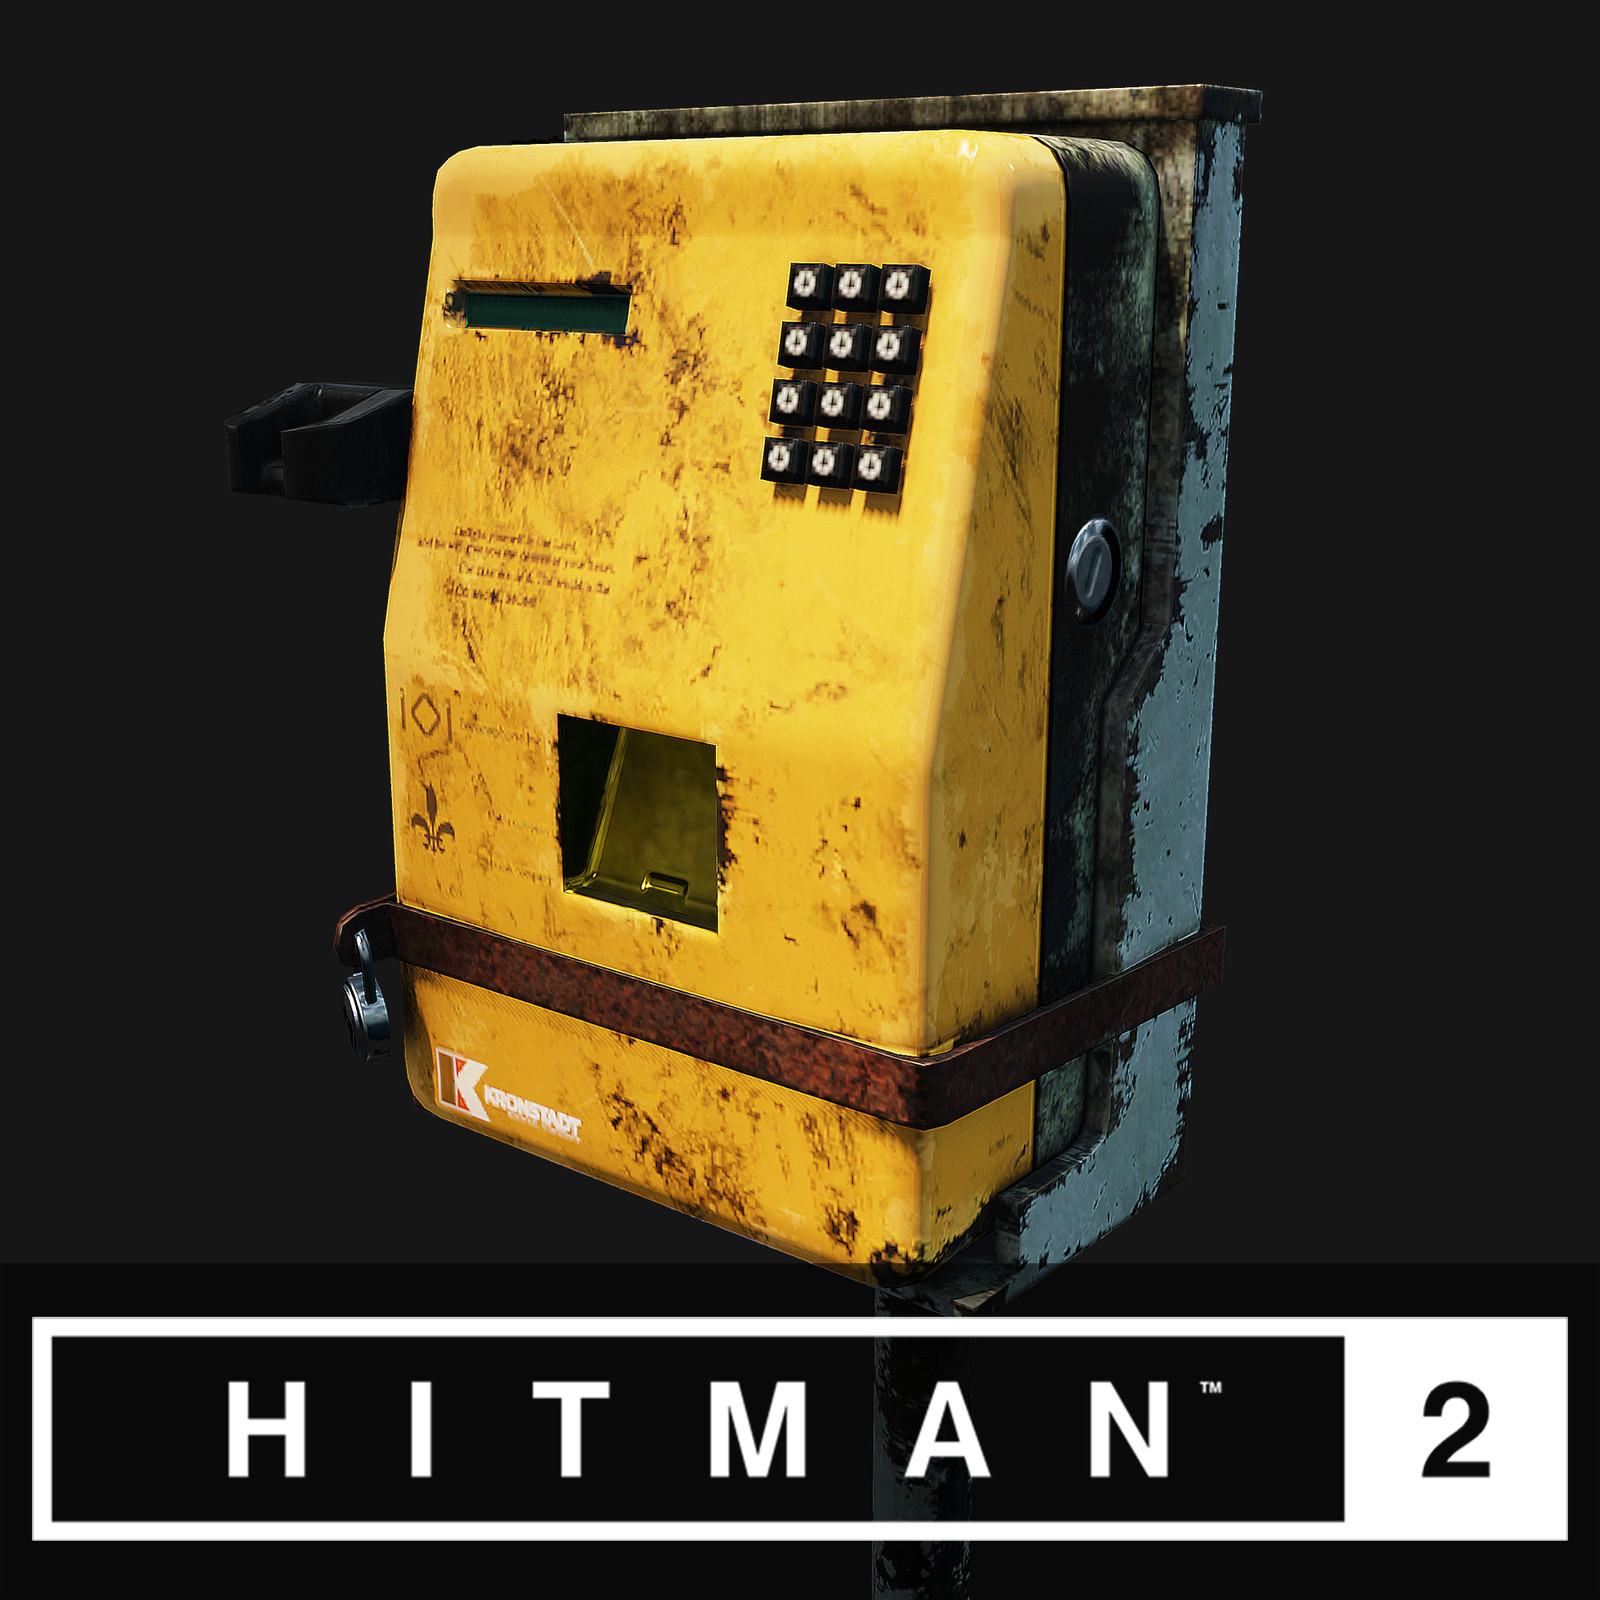 Hitman 2 - Props